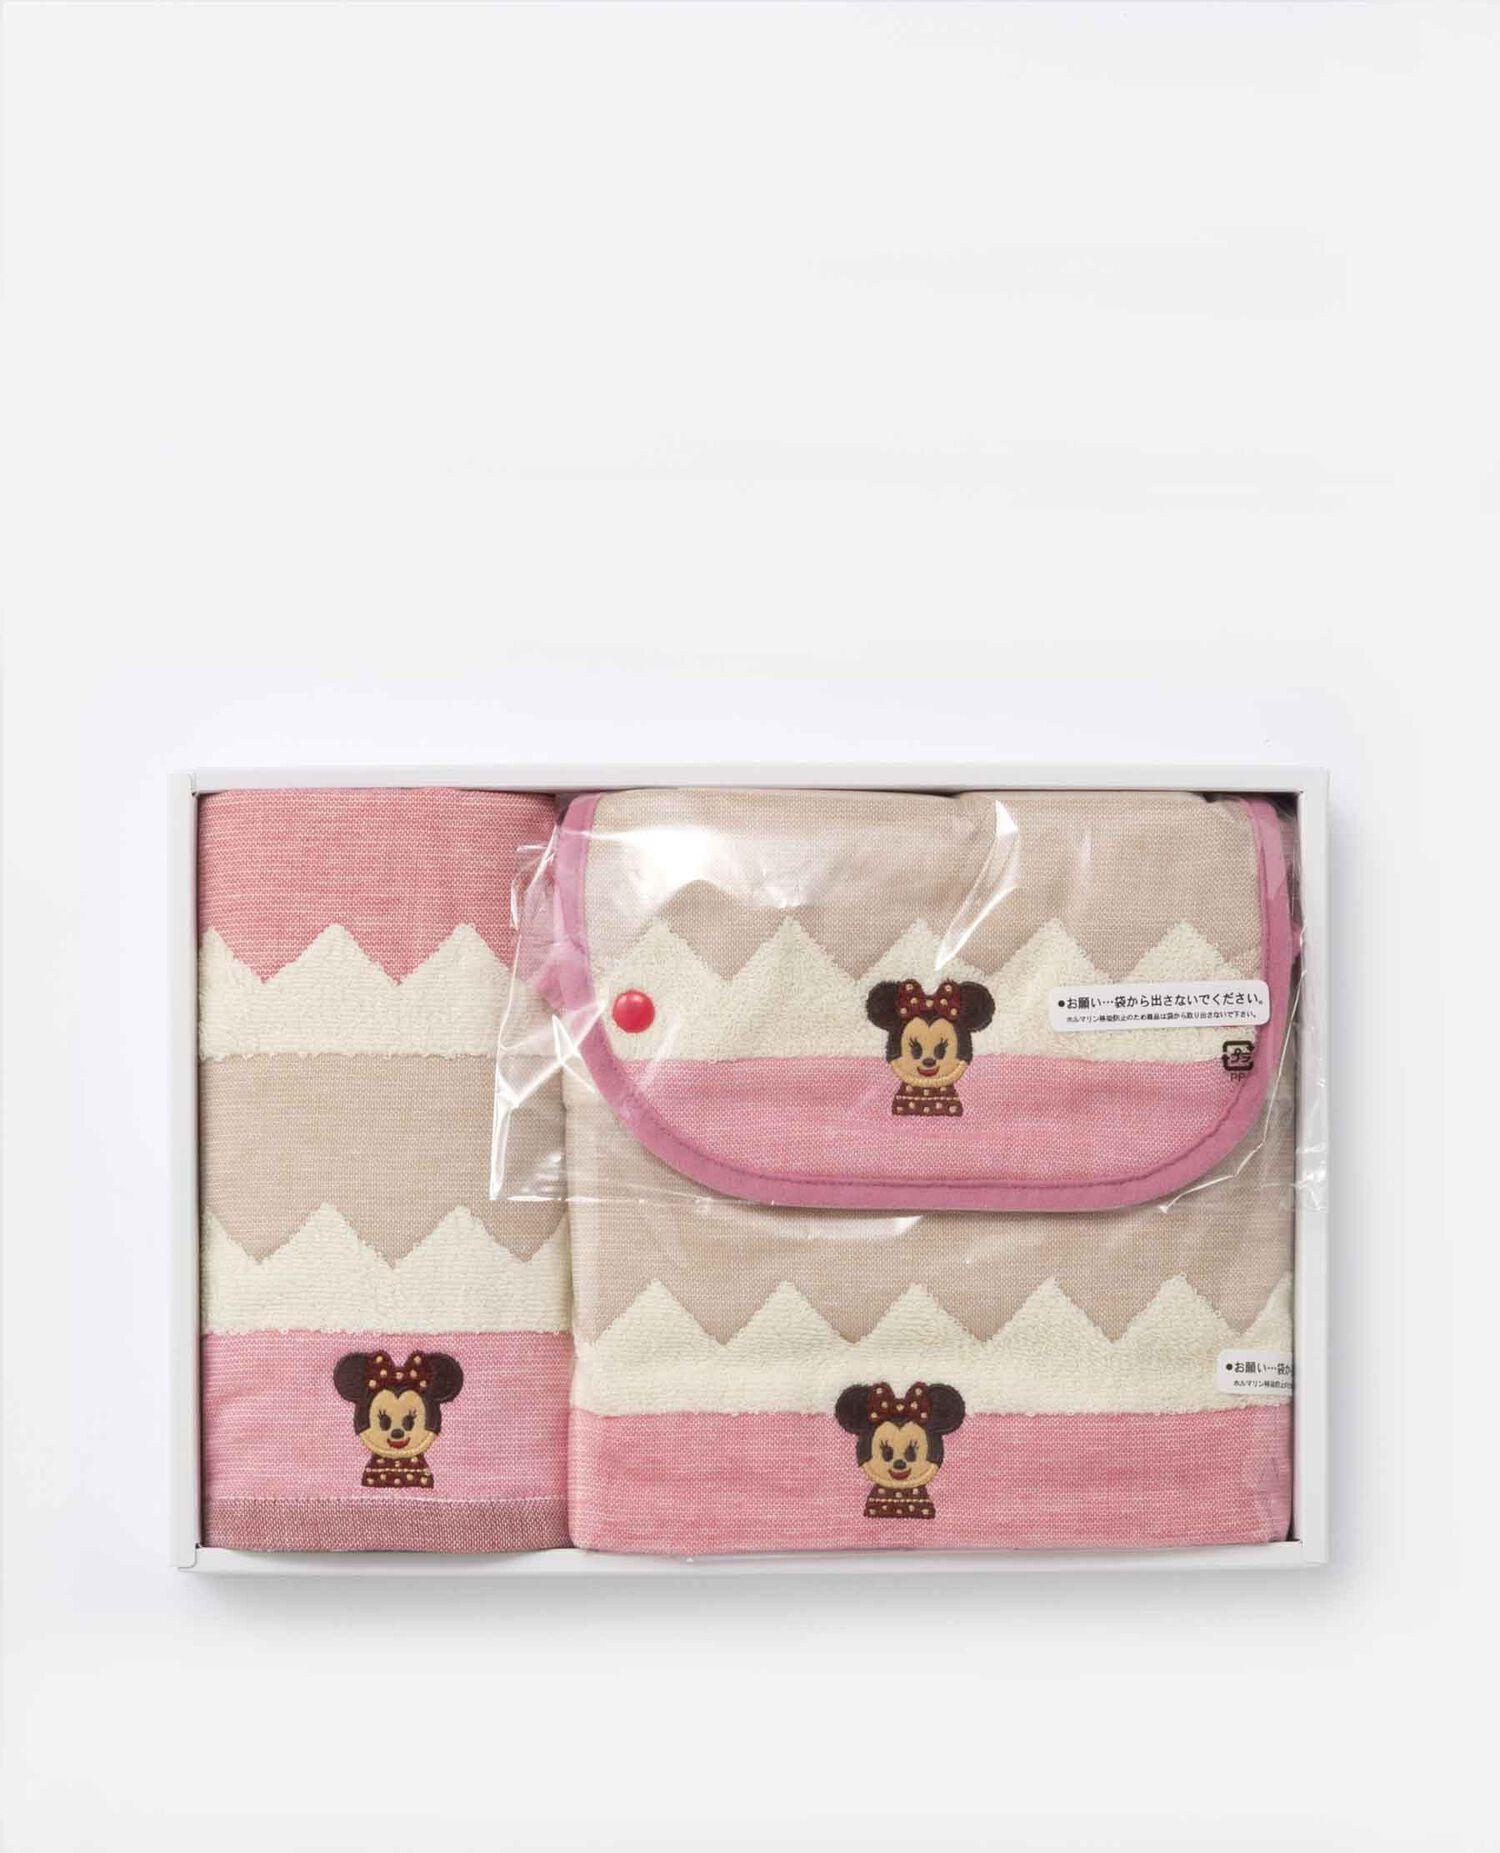 ZIGUZAGU タオルセット(フェイスタオル・スタイ・巾着) ミニーマウス